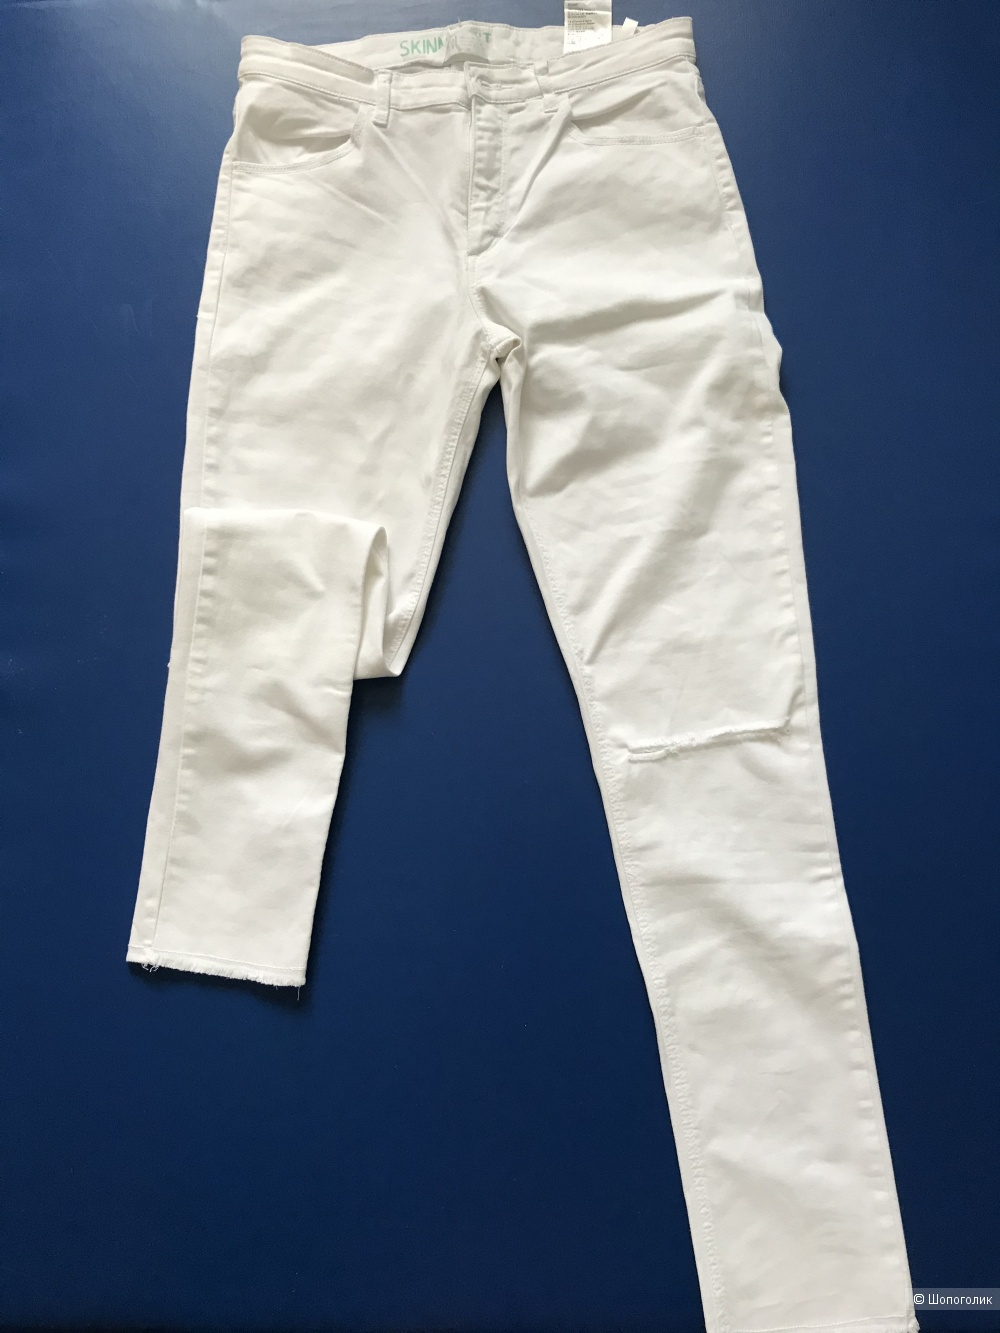 Белые джинсы Skinny ф.H&M на XXS-XS